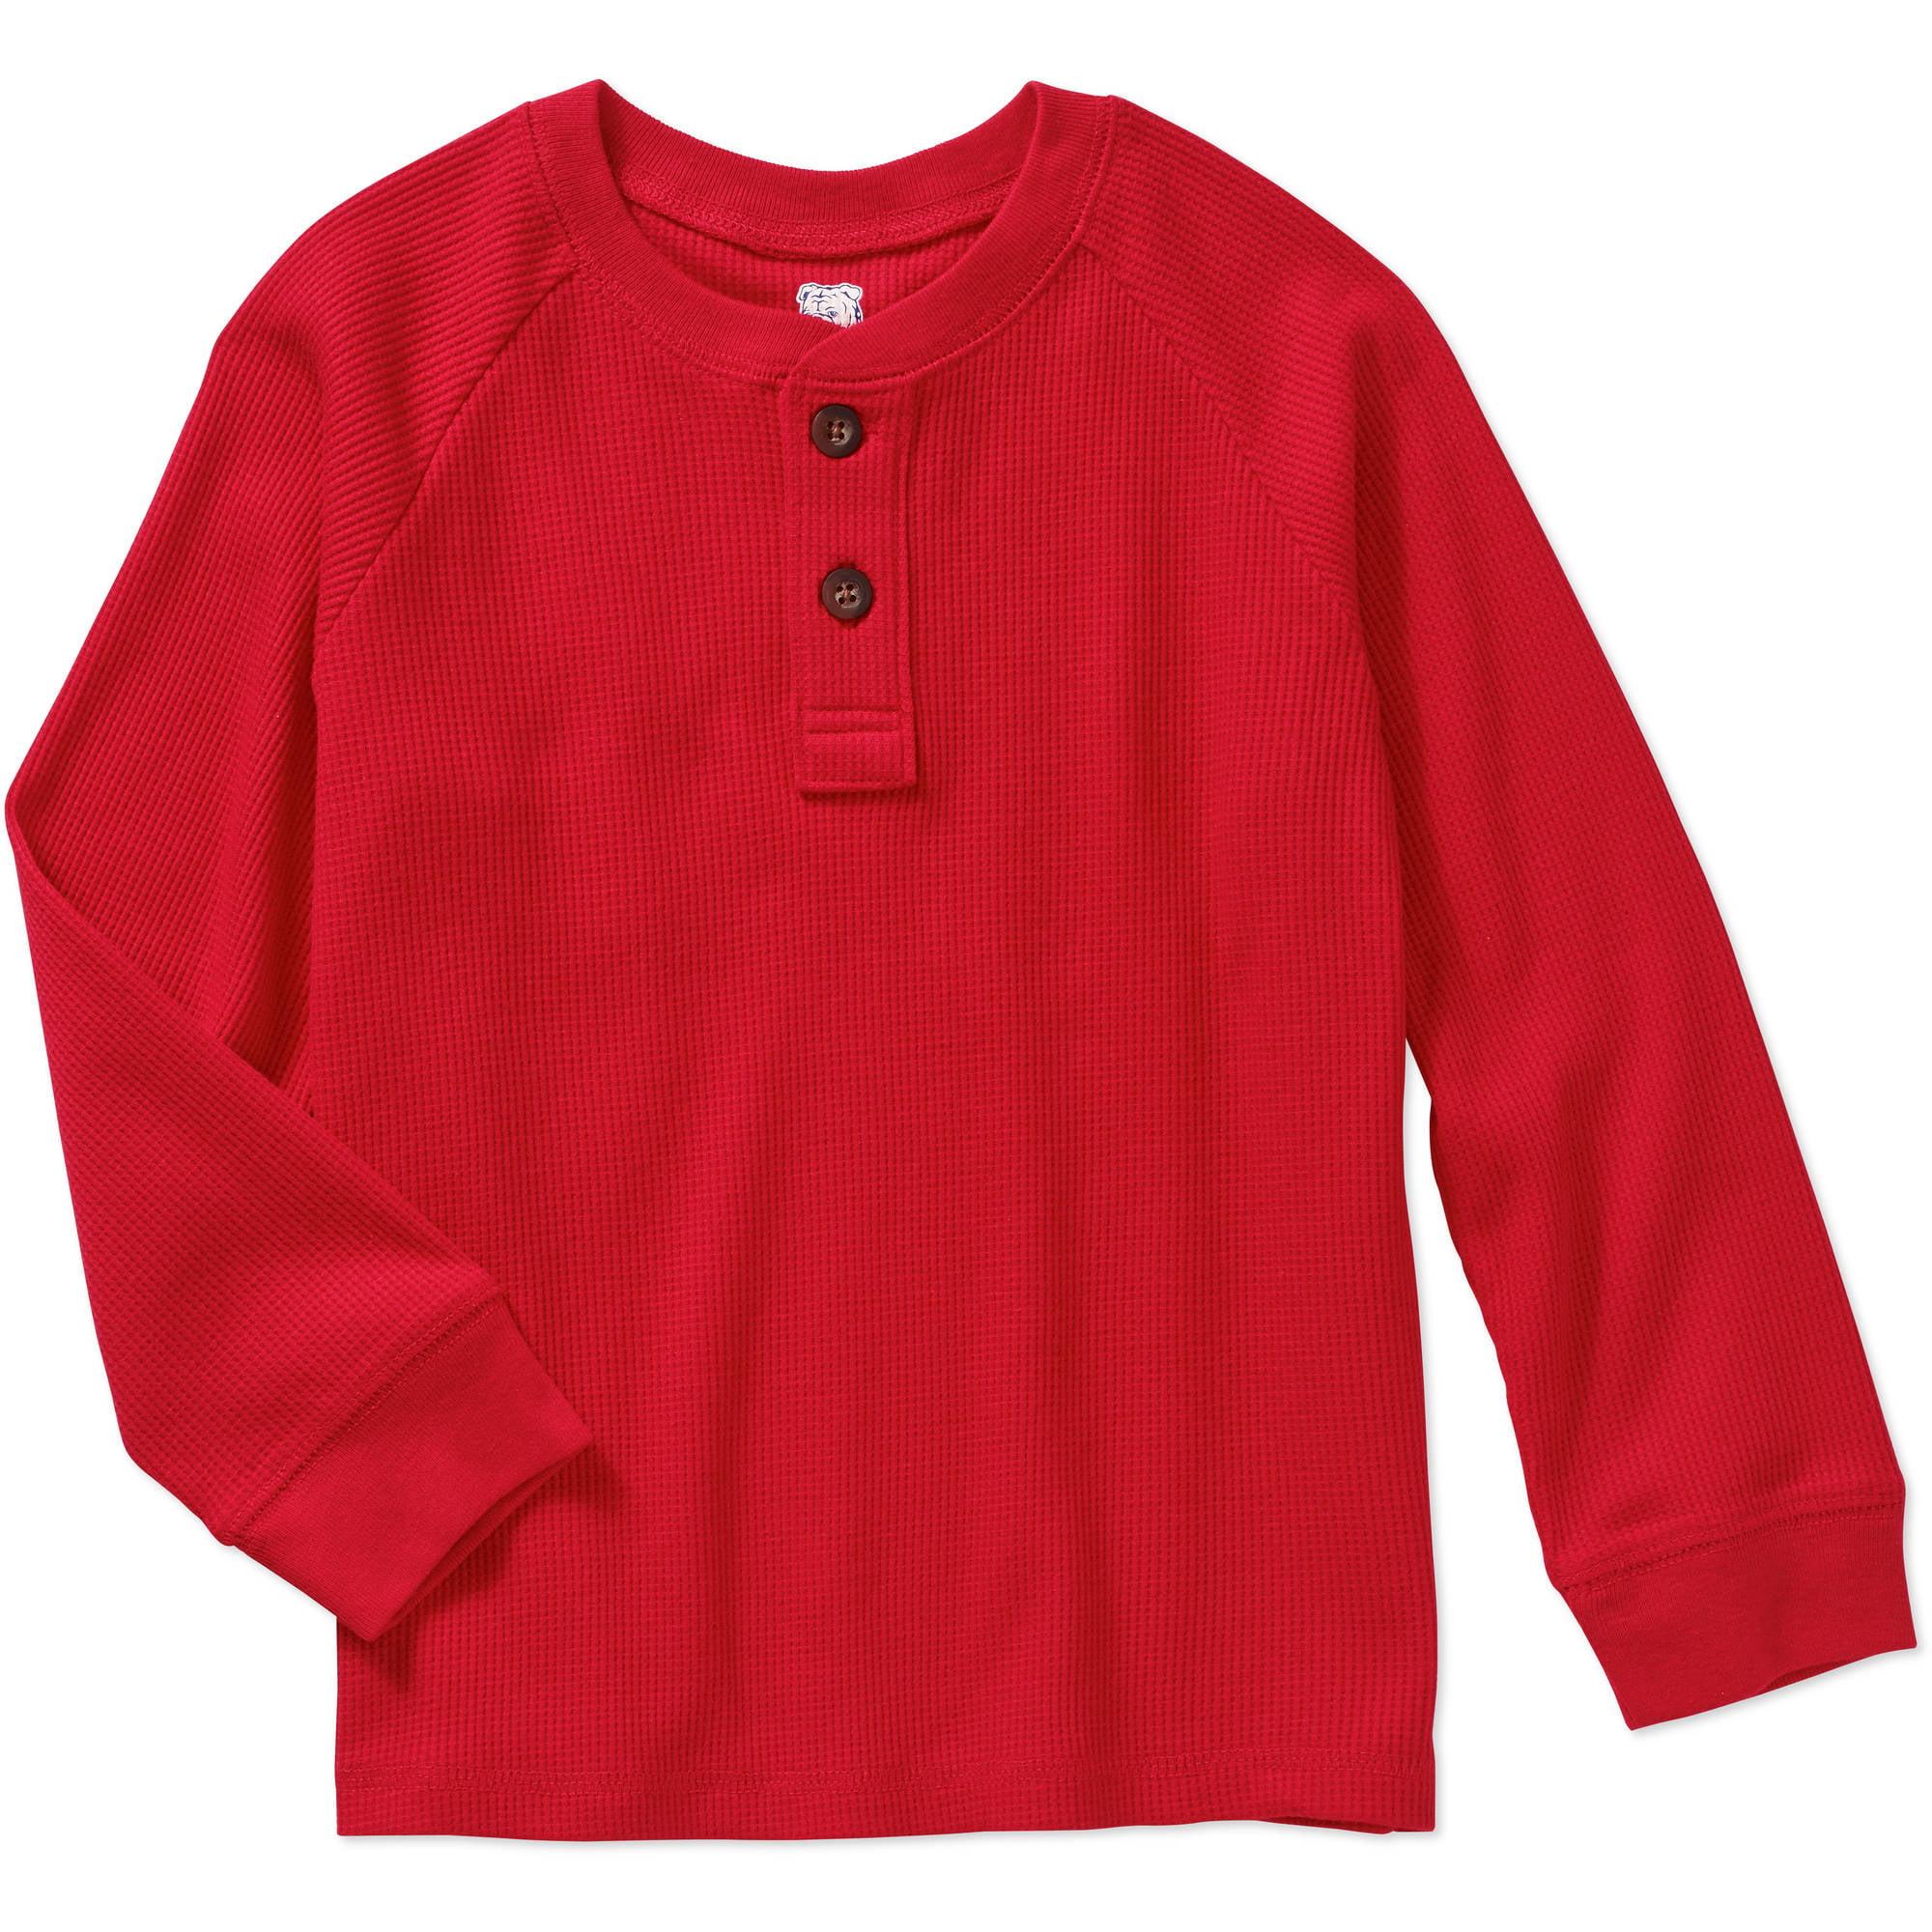 365 Kids From Garanimals Boys' Long Sleeve Thermal Henley Tee Shirt